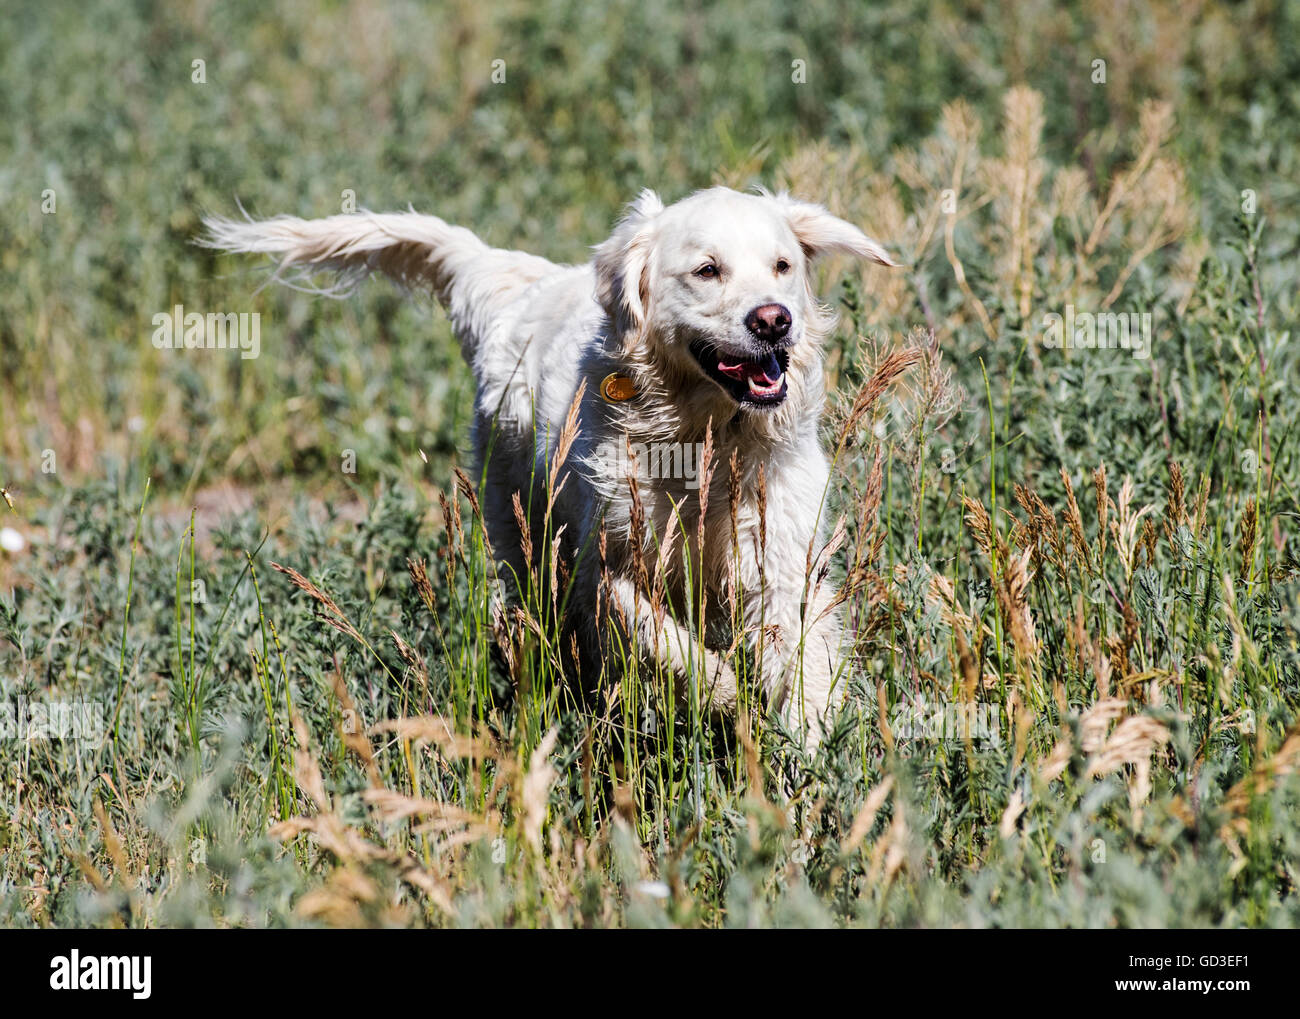 Platinum colored Golden Retriever dog running on a Colorado Ranch; USA - Stock Image